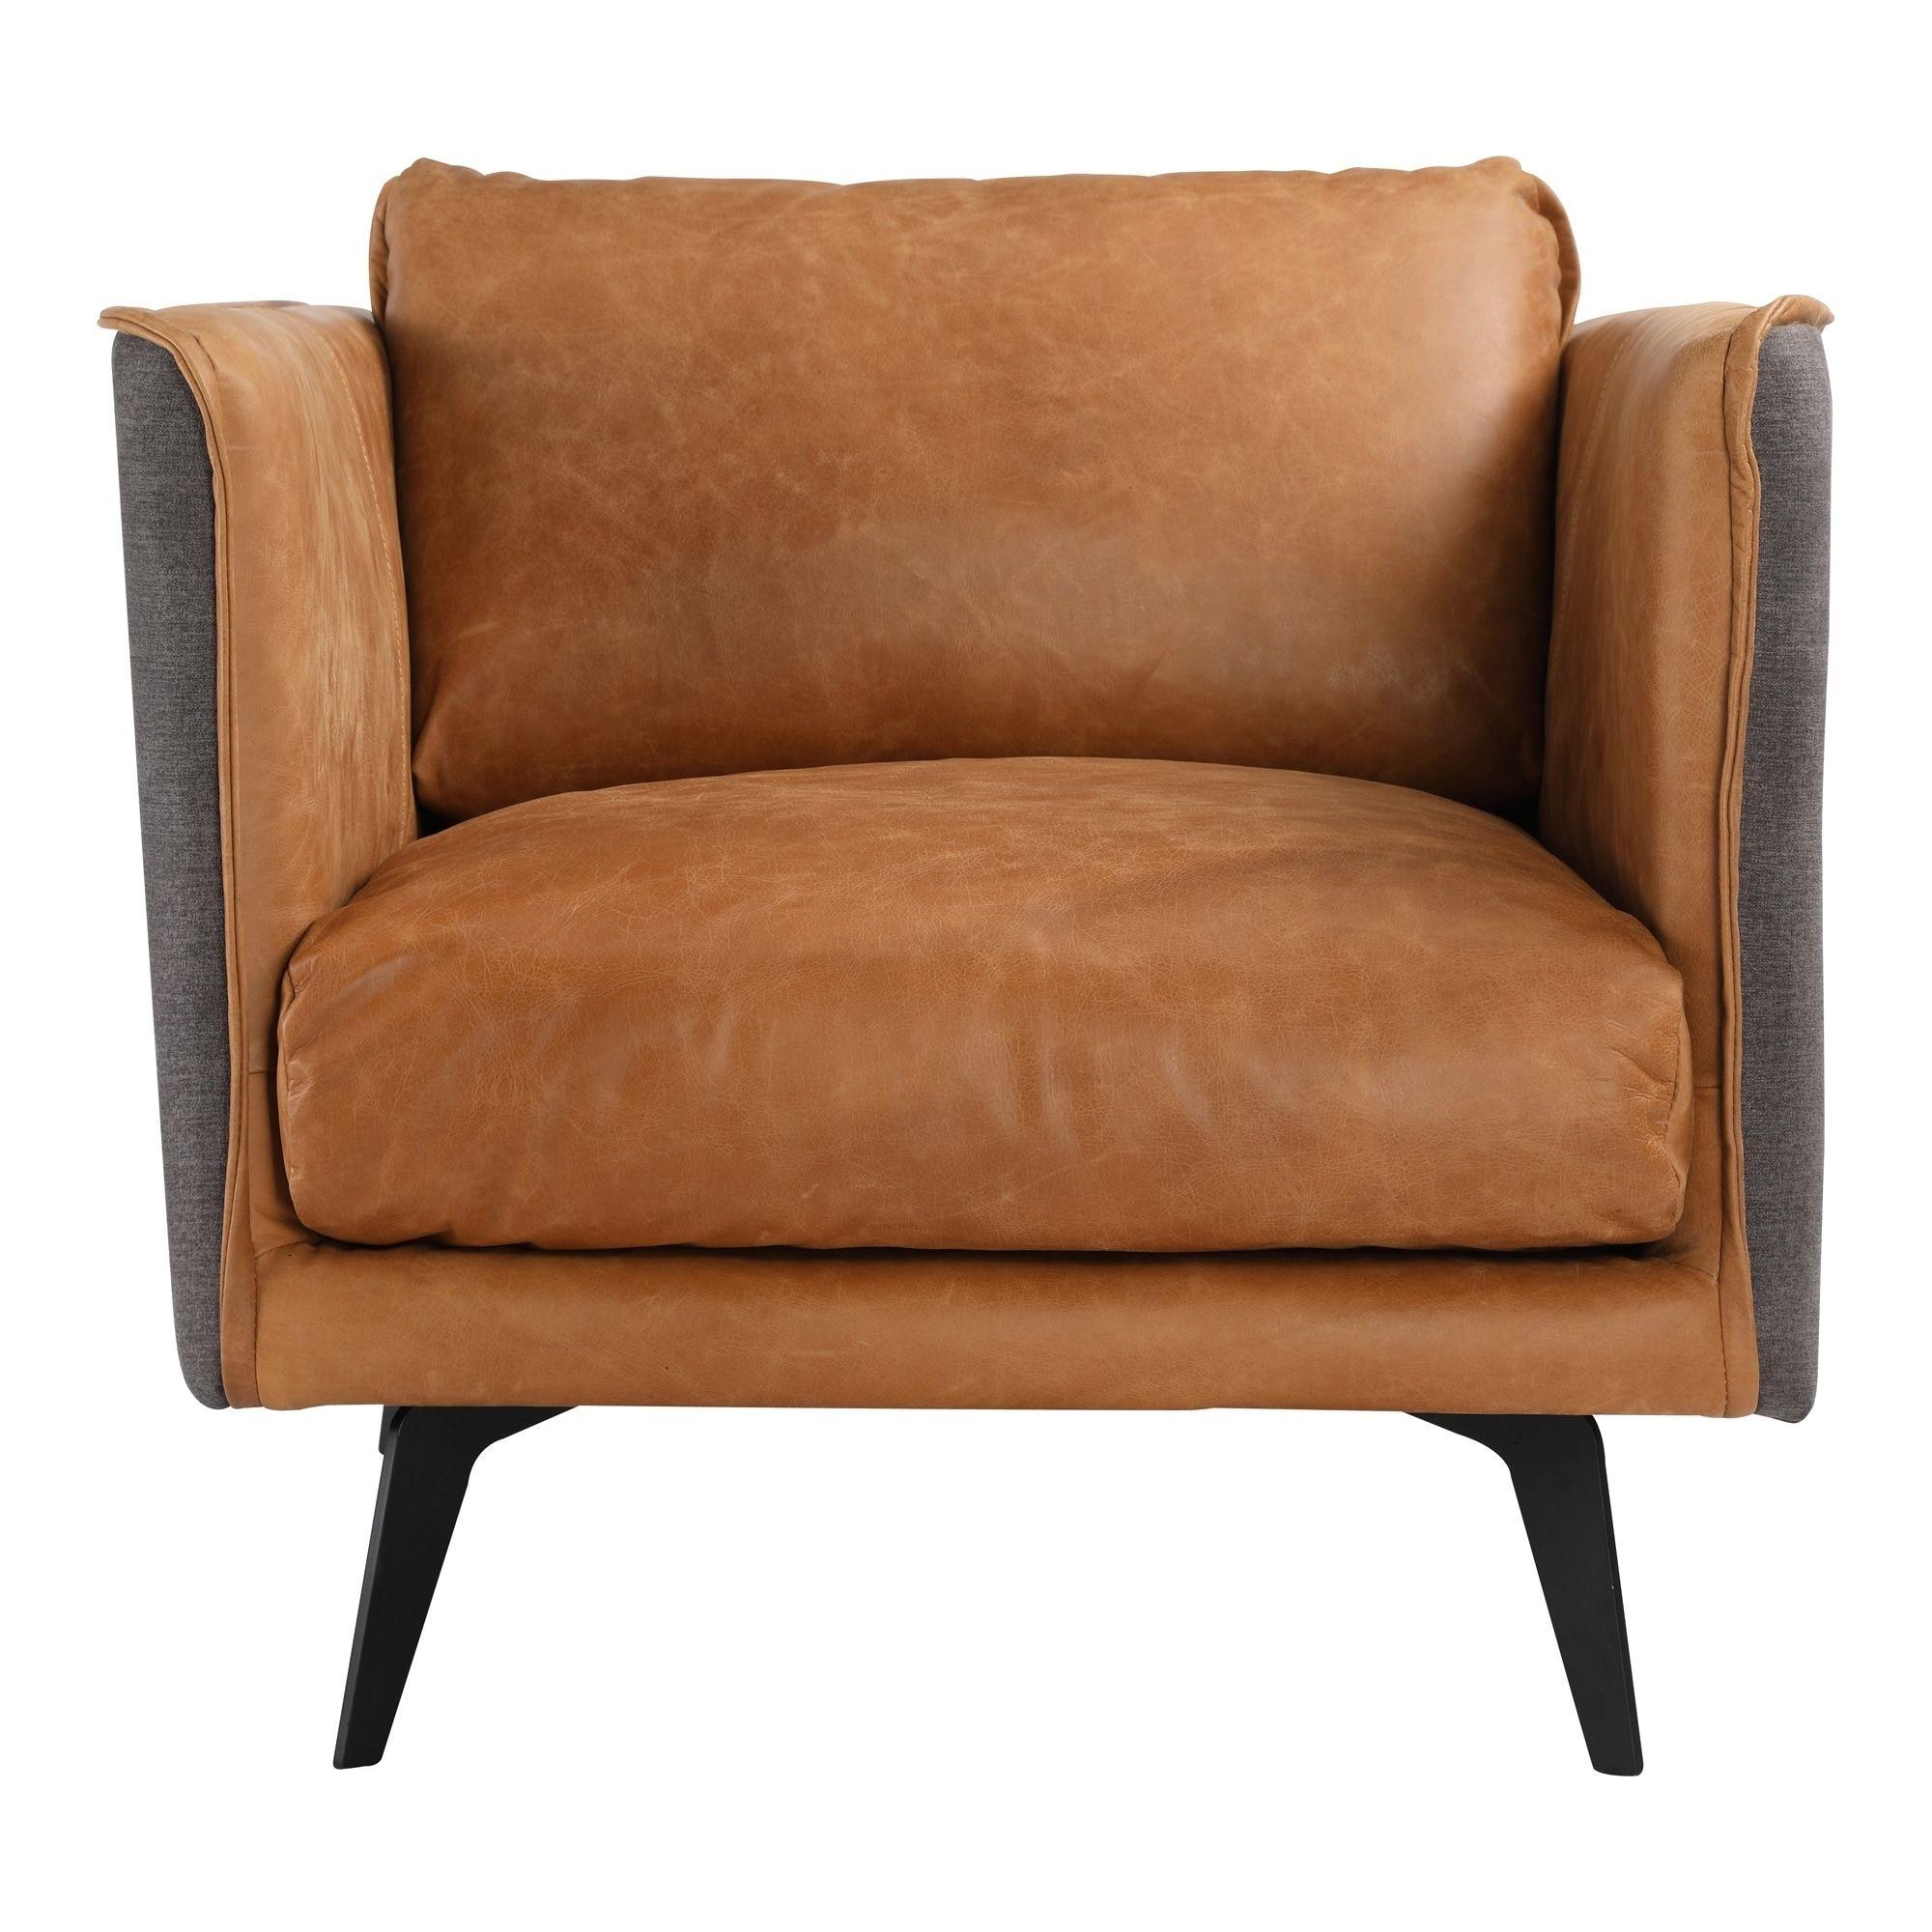 Strange Aurelle Home Mid Century Modern Cognac Leather Arm Chair Gamerscity Chair Design For Home Gamerscityorg